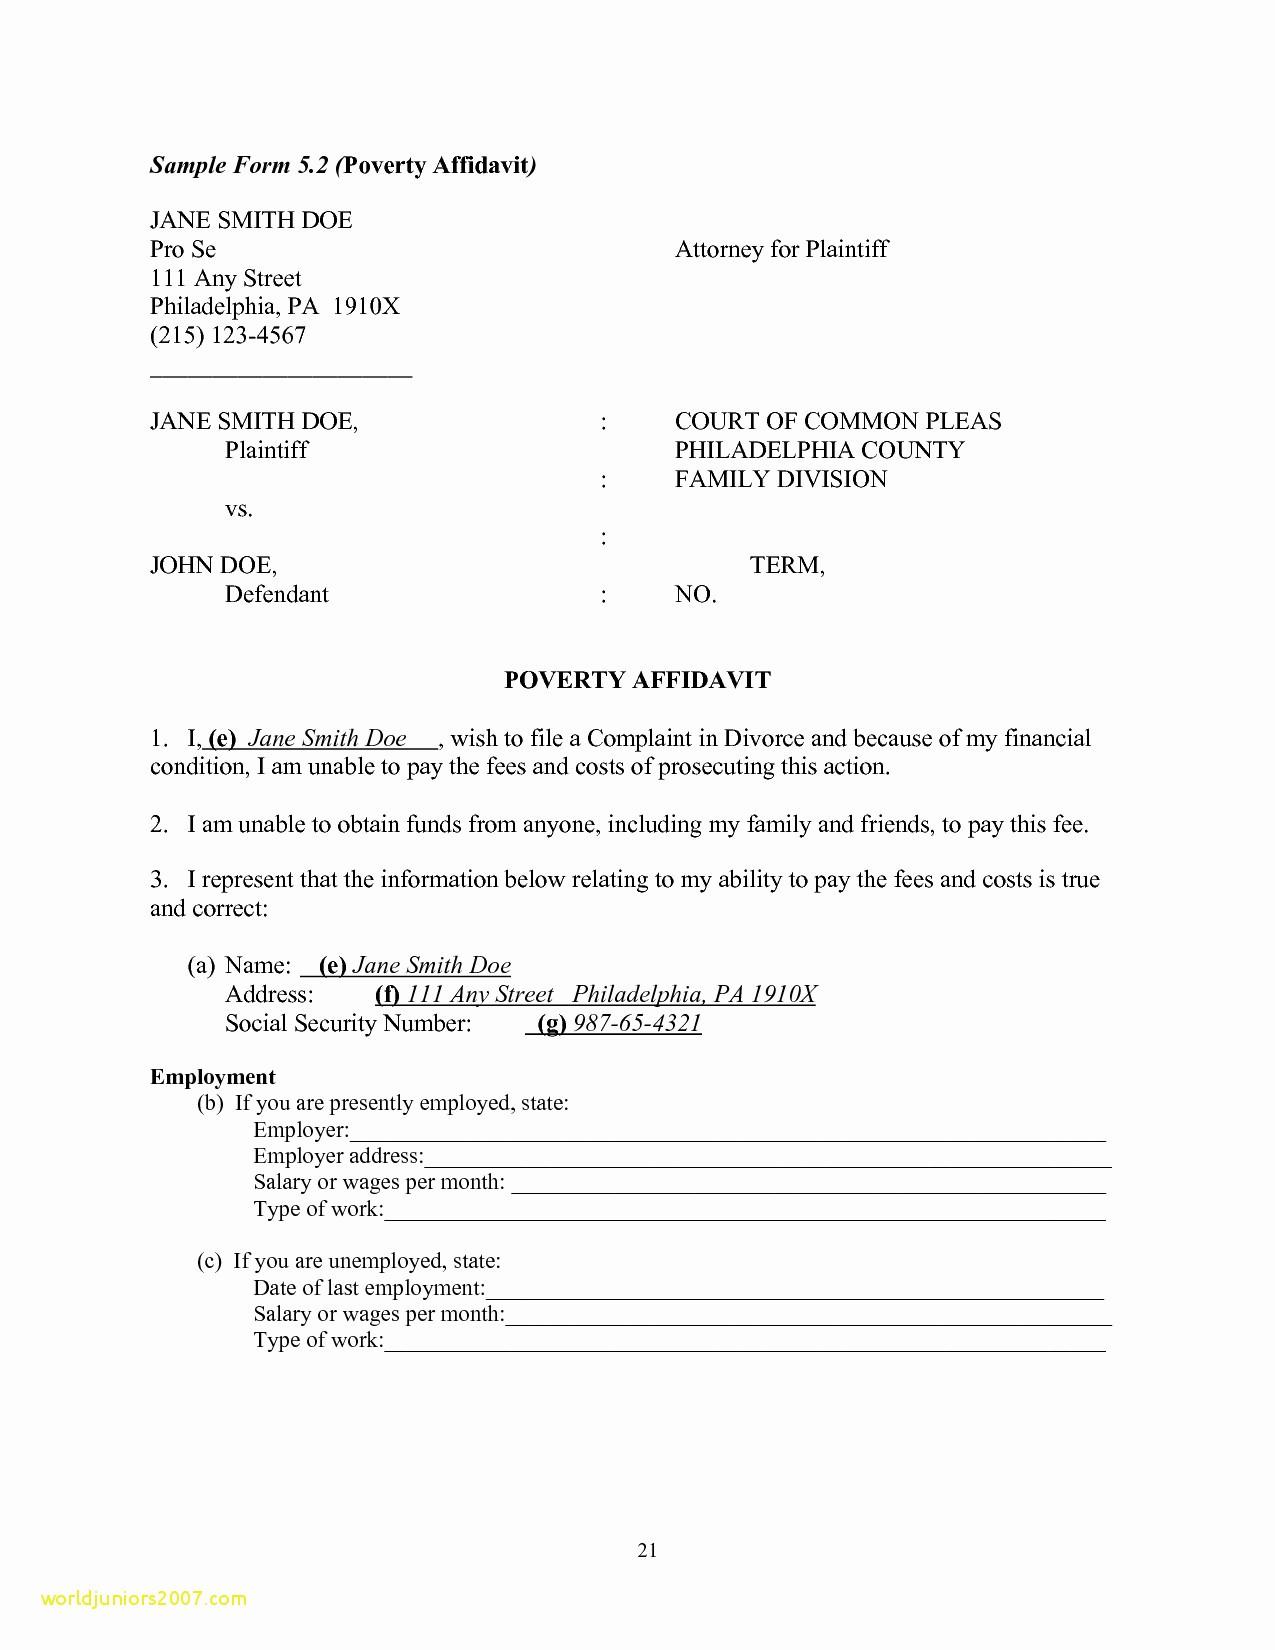 Affidavit Of Support Template Letter - Cover Letter for Affidavit Support